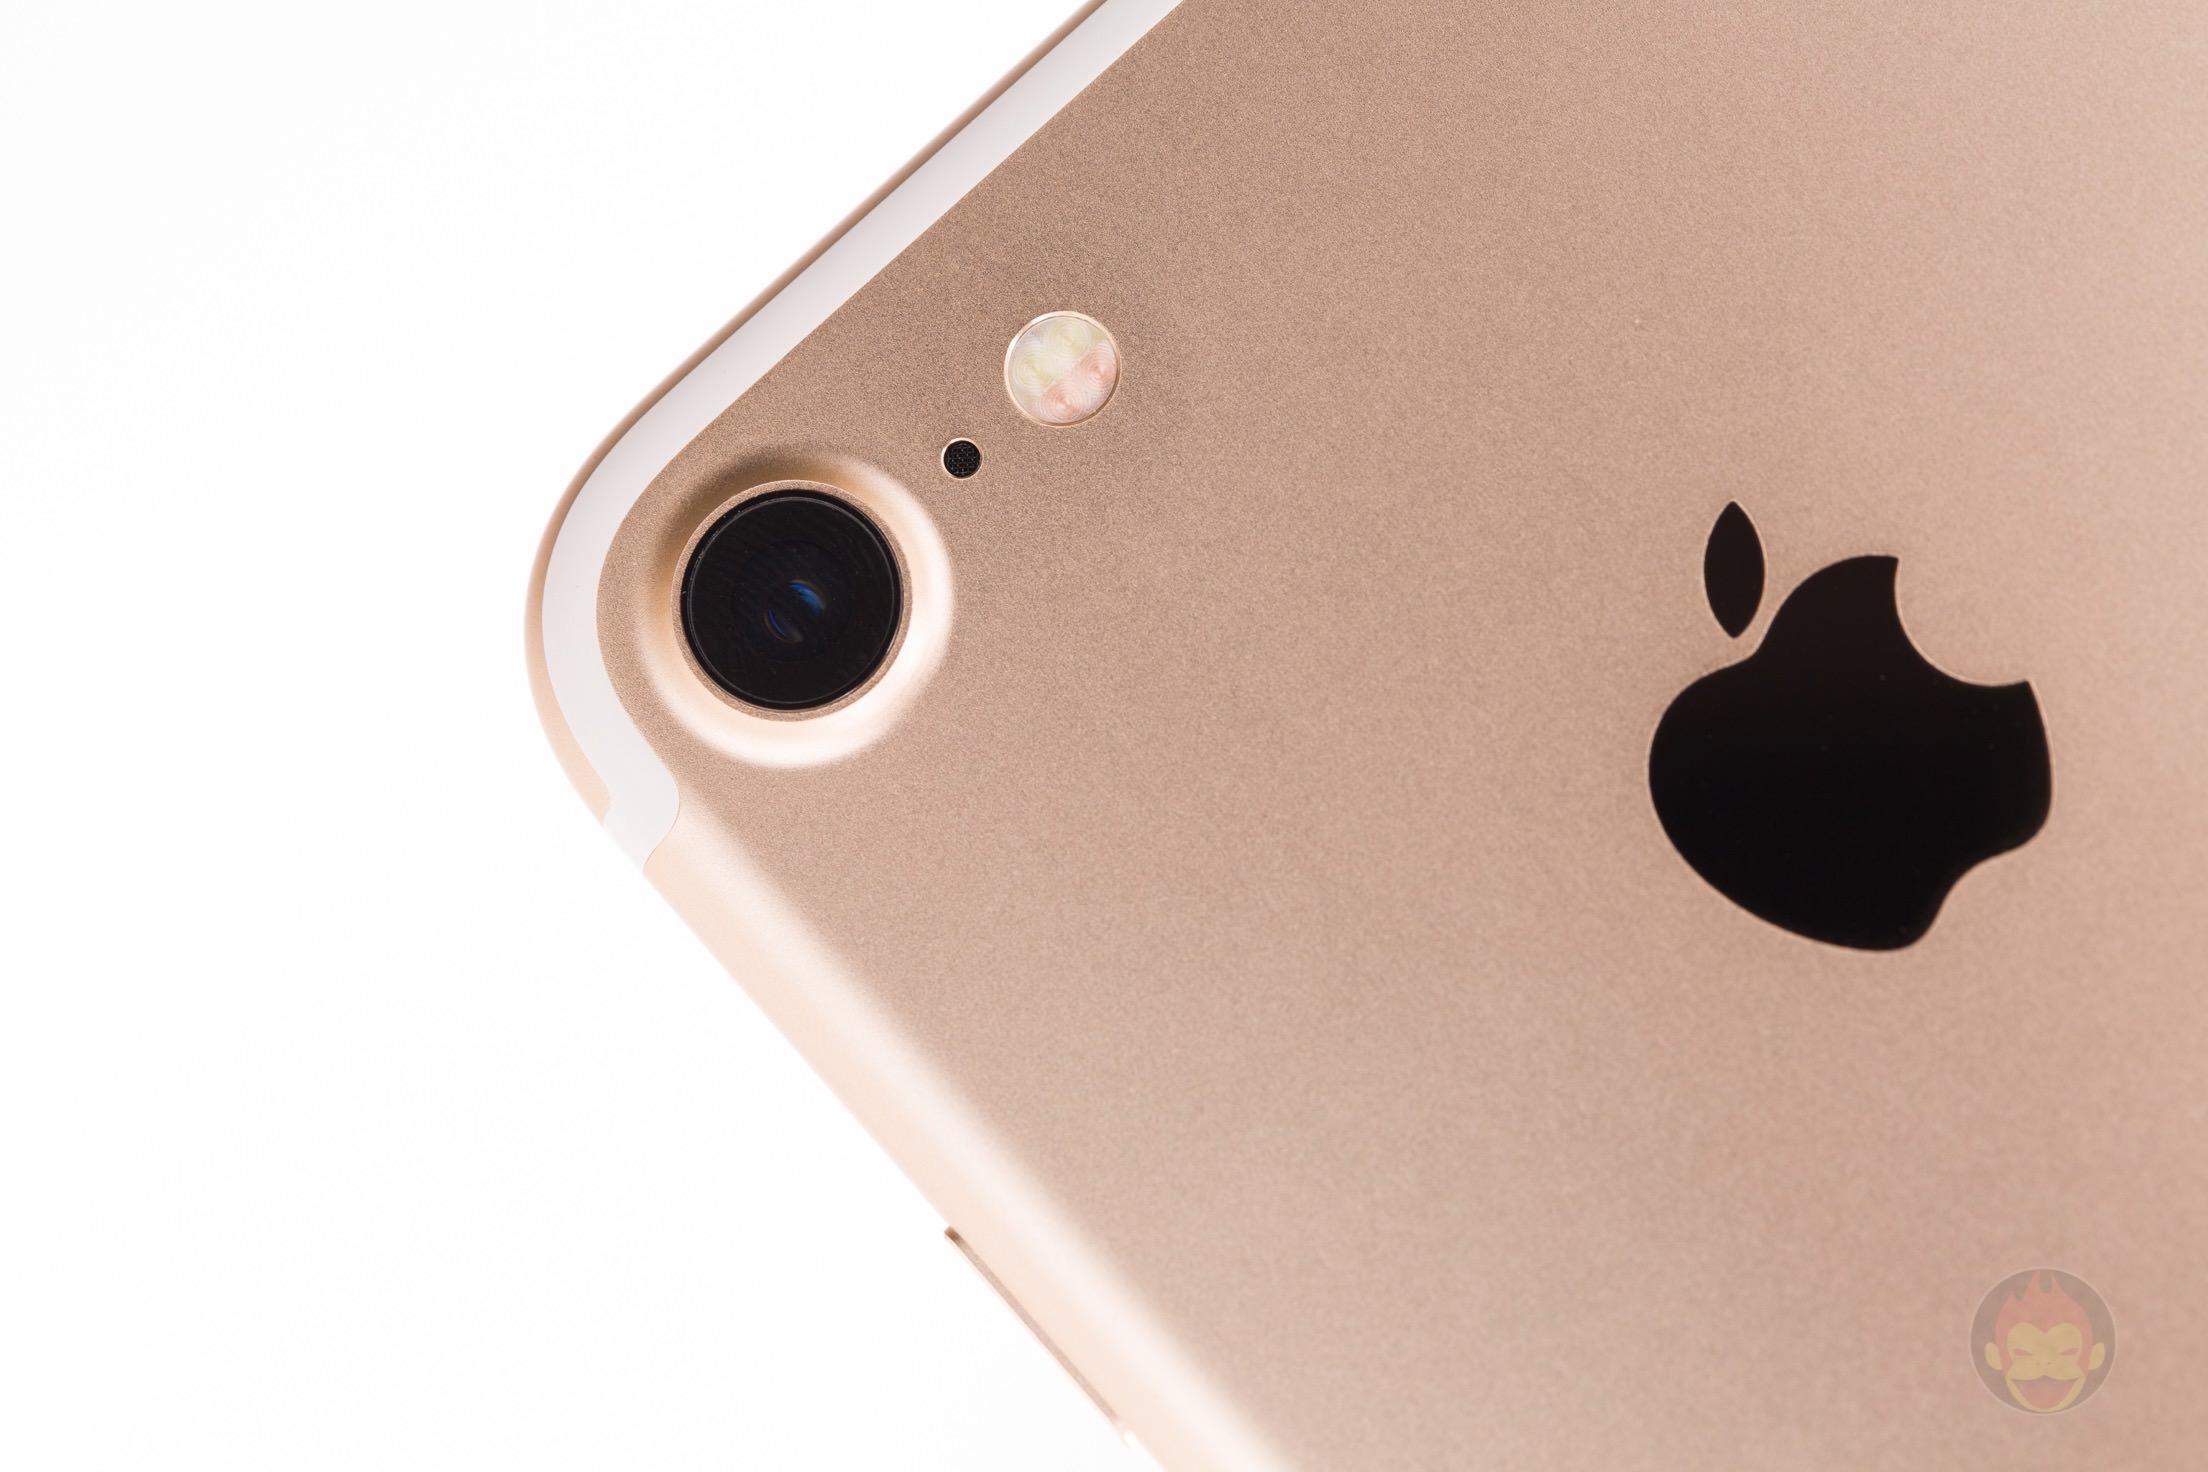 iPhone-7-Gold-Model-06.jpg